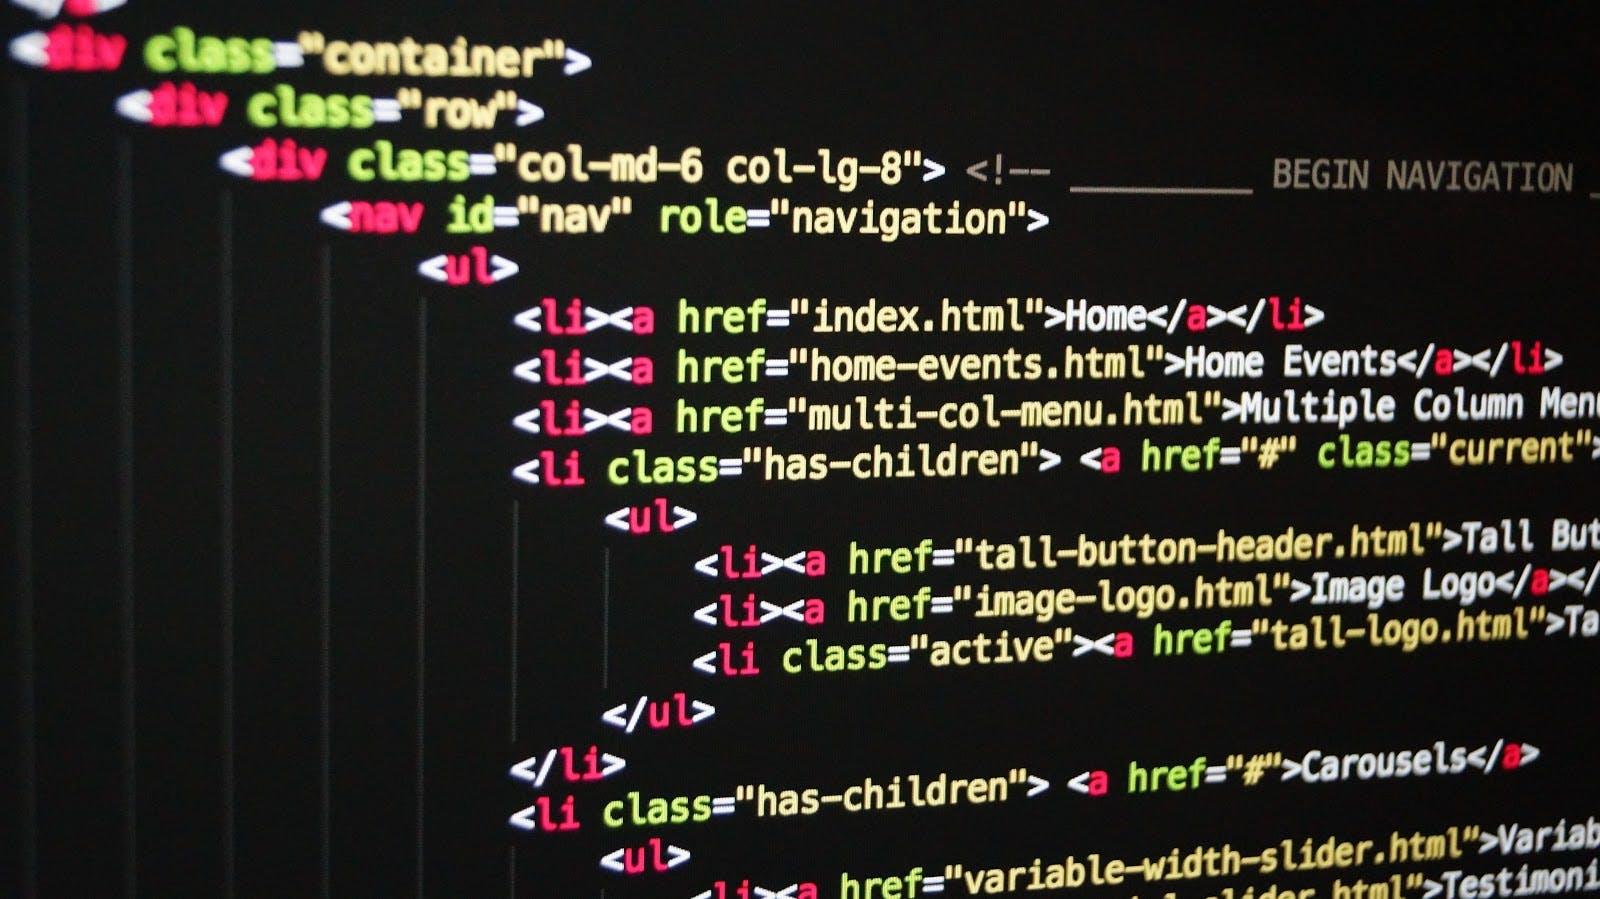 Debugging code on screen.